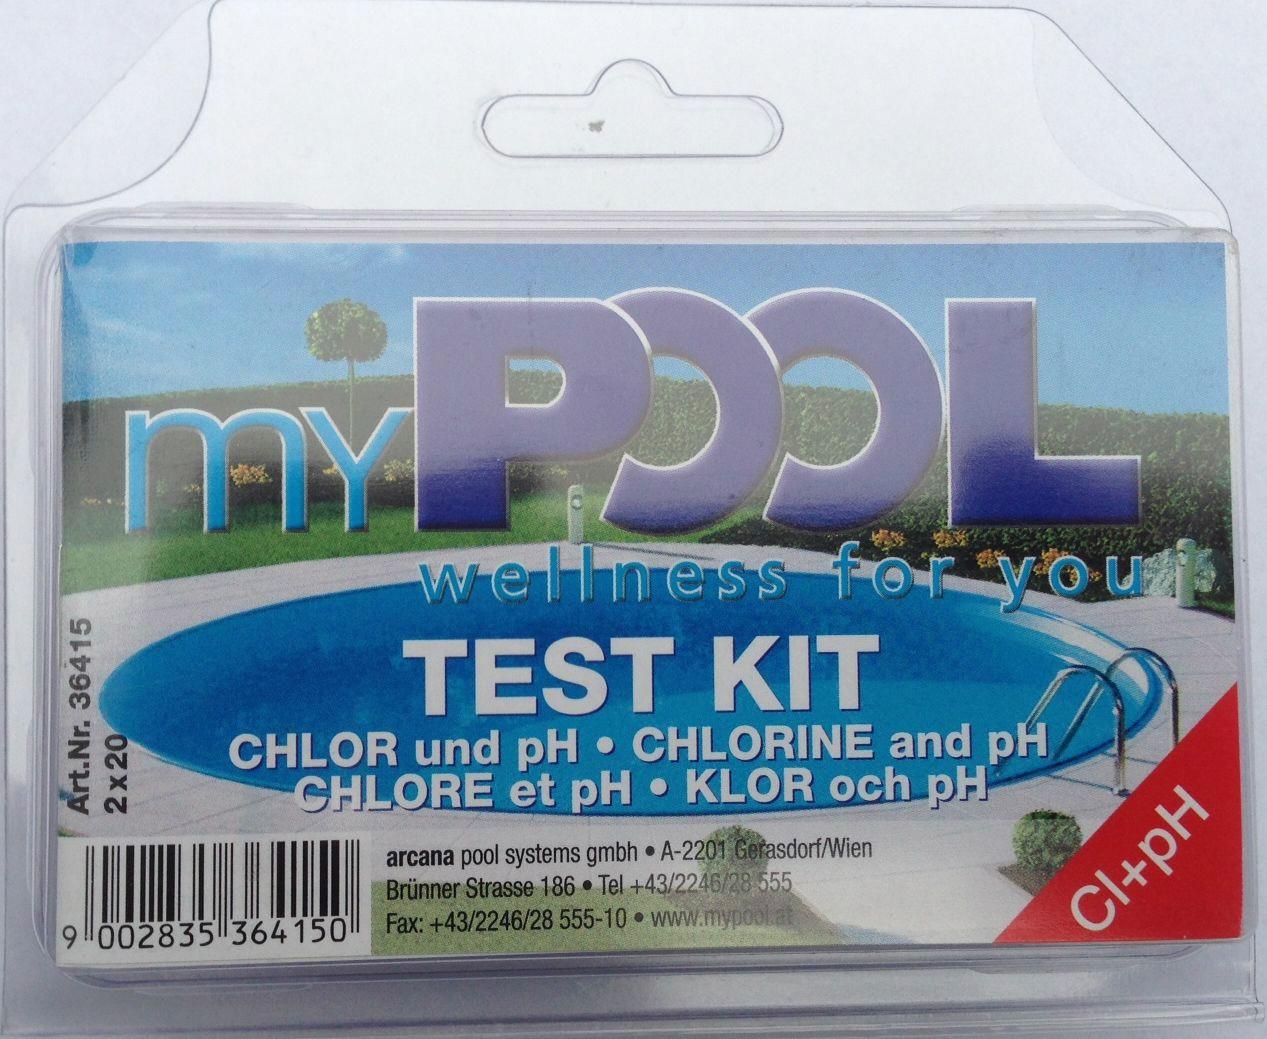 MYPOOL Wasserpflege »Chlor- und pH-Testgerät«, inkl. Poolpflege | Garten > Swimmingpools > Poolpflege | Blau | MYPOOL